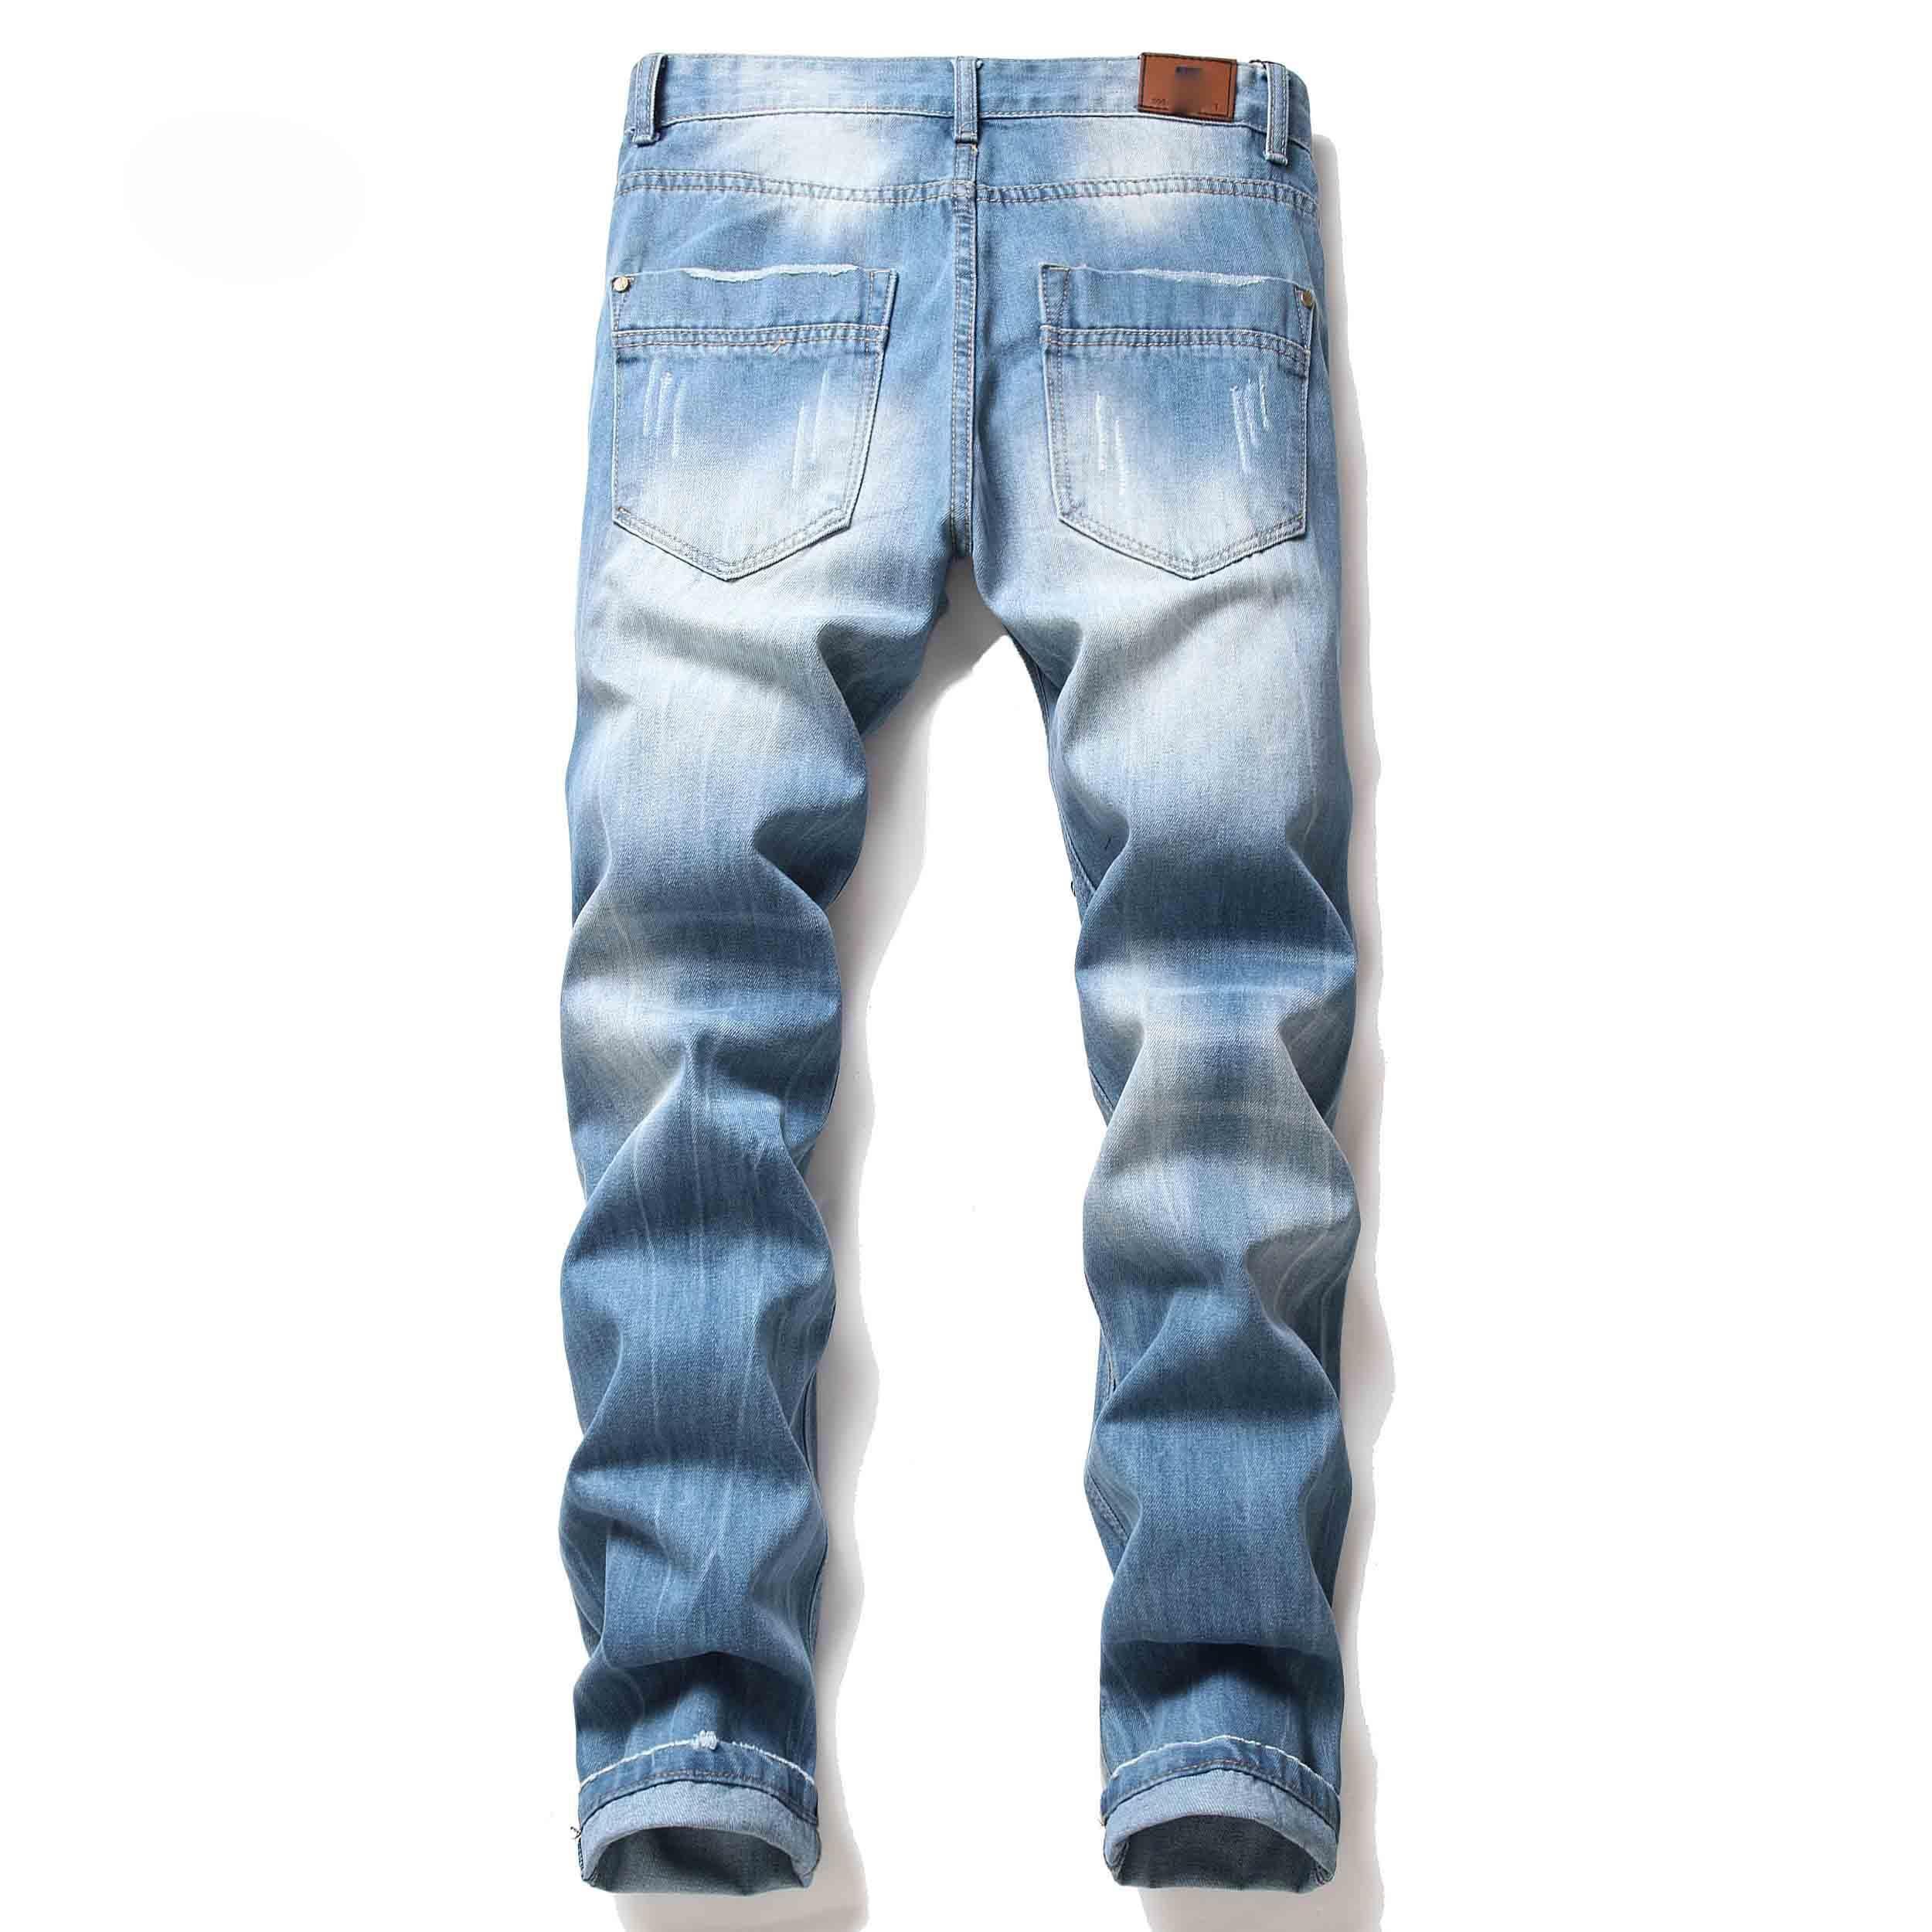 Yırtık Delik Bisiklet Motosiklet Rock Revival Pantolon Fermuar Kuaför Nakış Jeans Mavi Perişan Pantolon